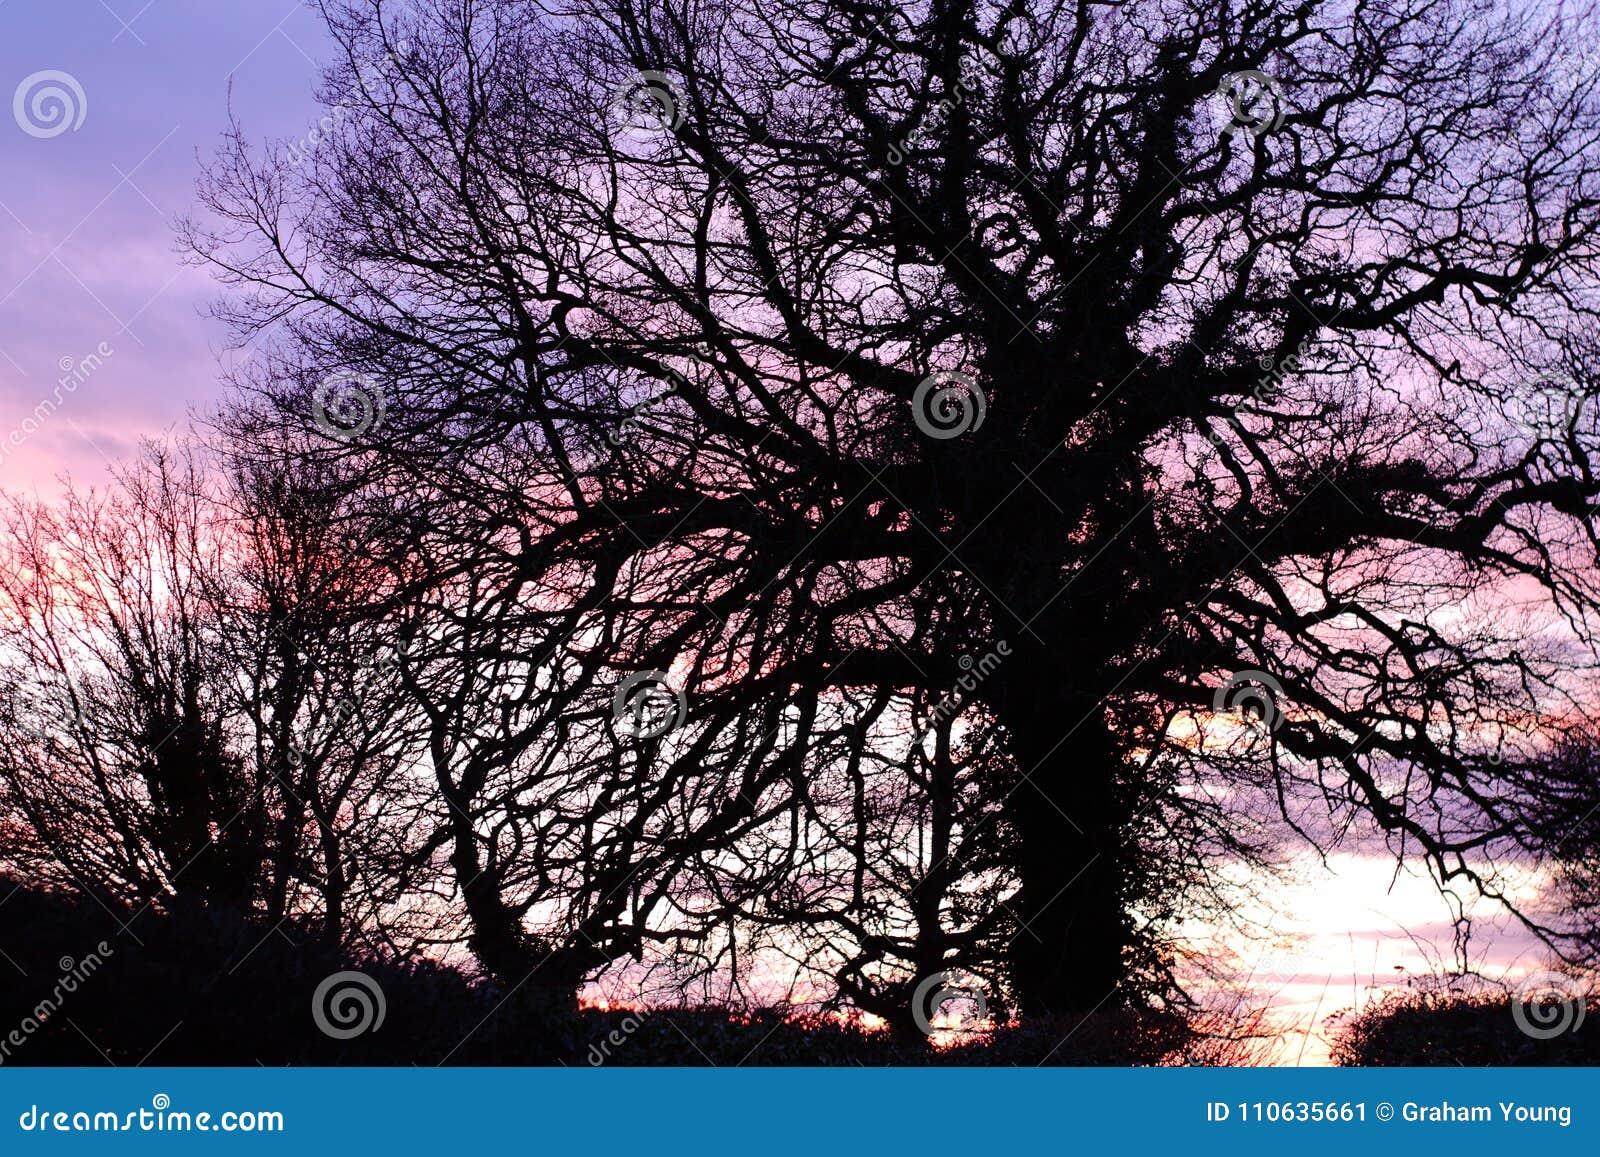 Suffolkbaum silouette